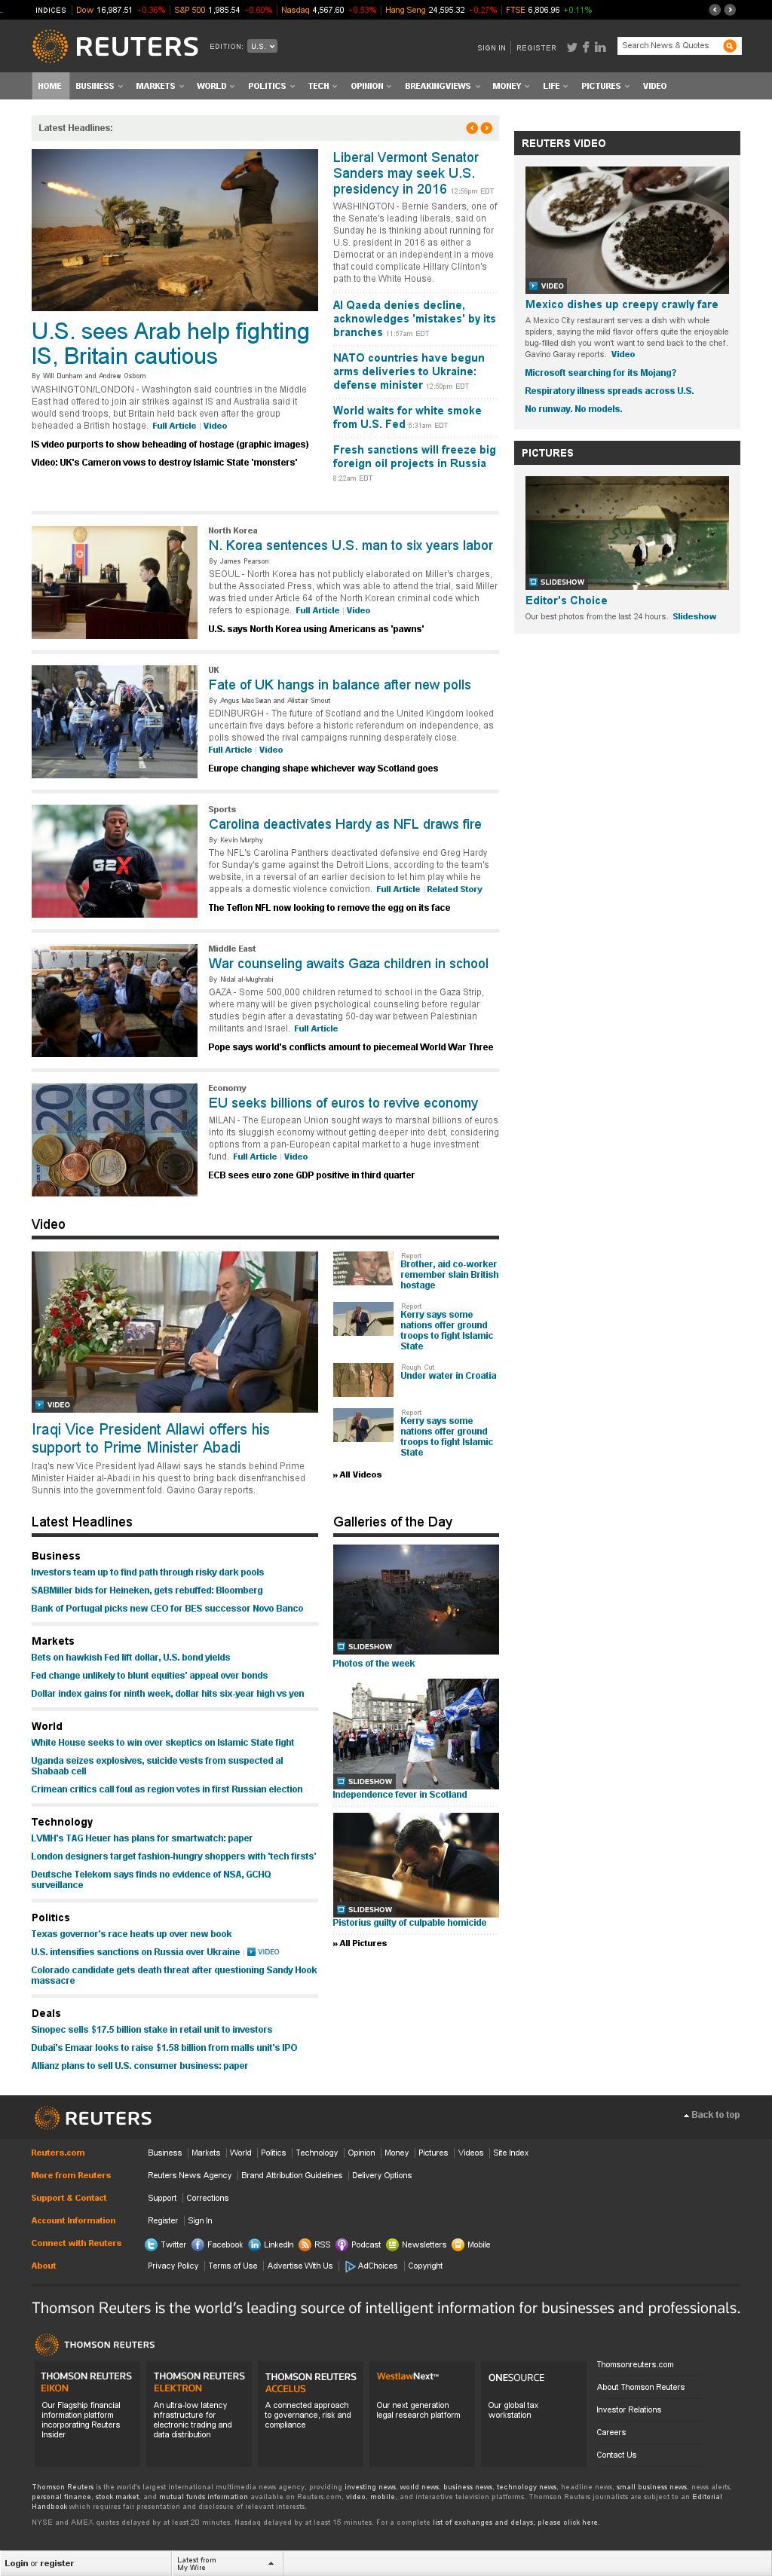 Reuters at Sunday Sept. 14, 2014, 8:15 p.m. UTC